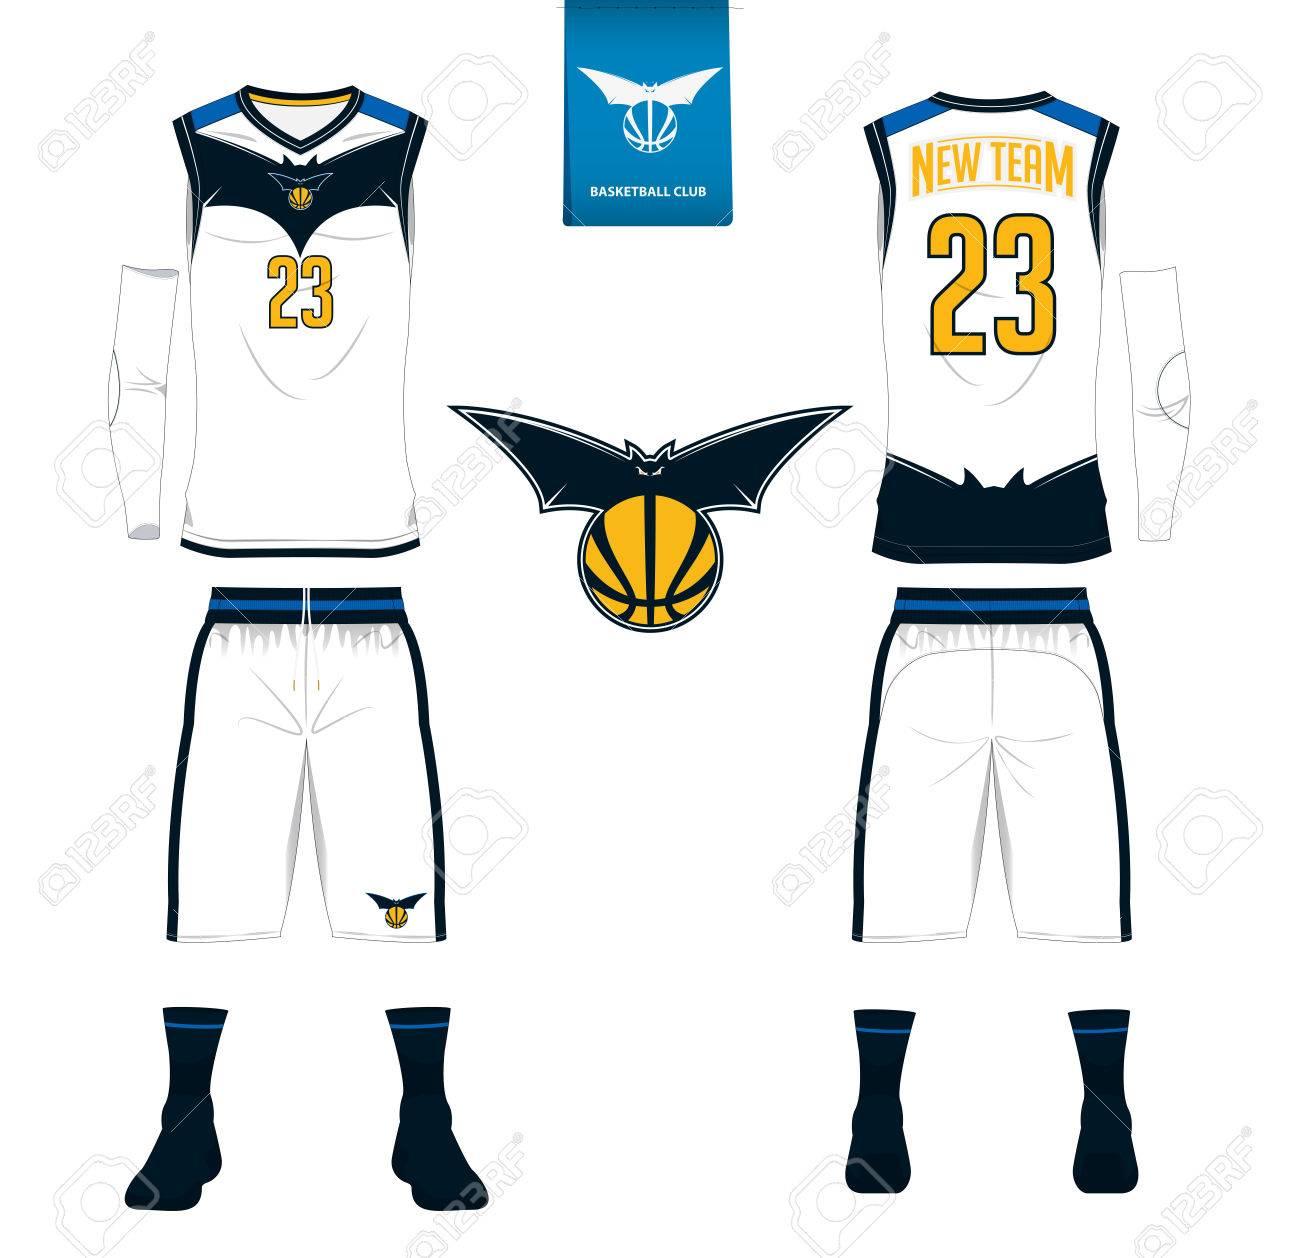 Basketball Trikot, Shorts, Socken Vorlage Für Basketball-Club ...